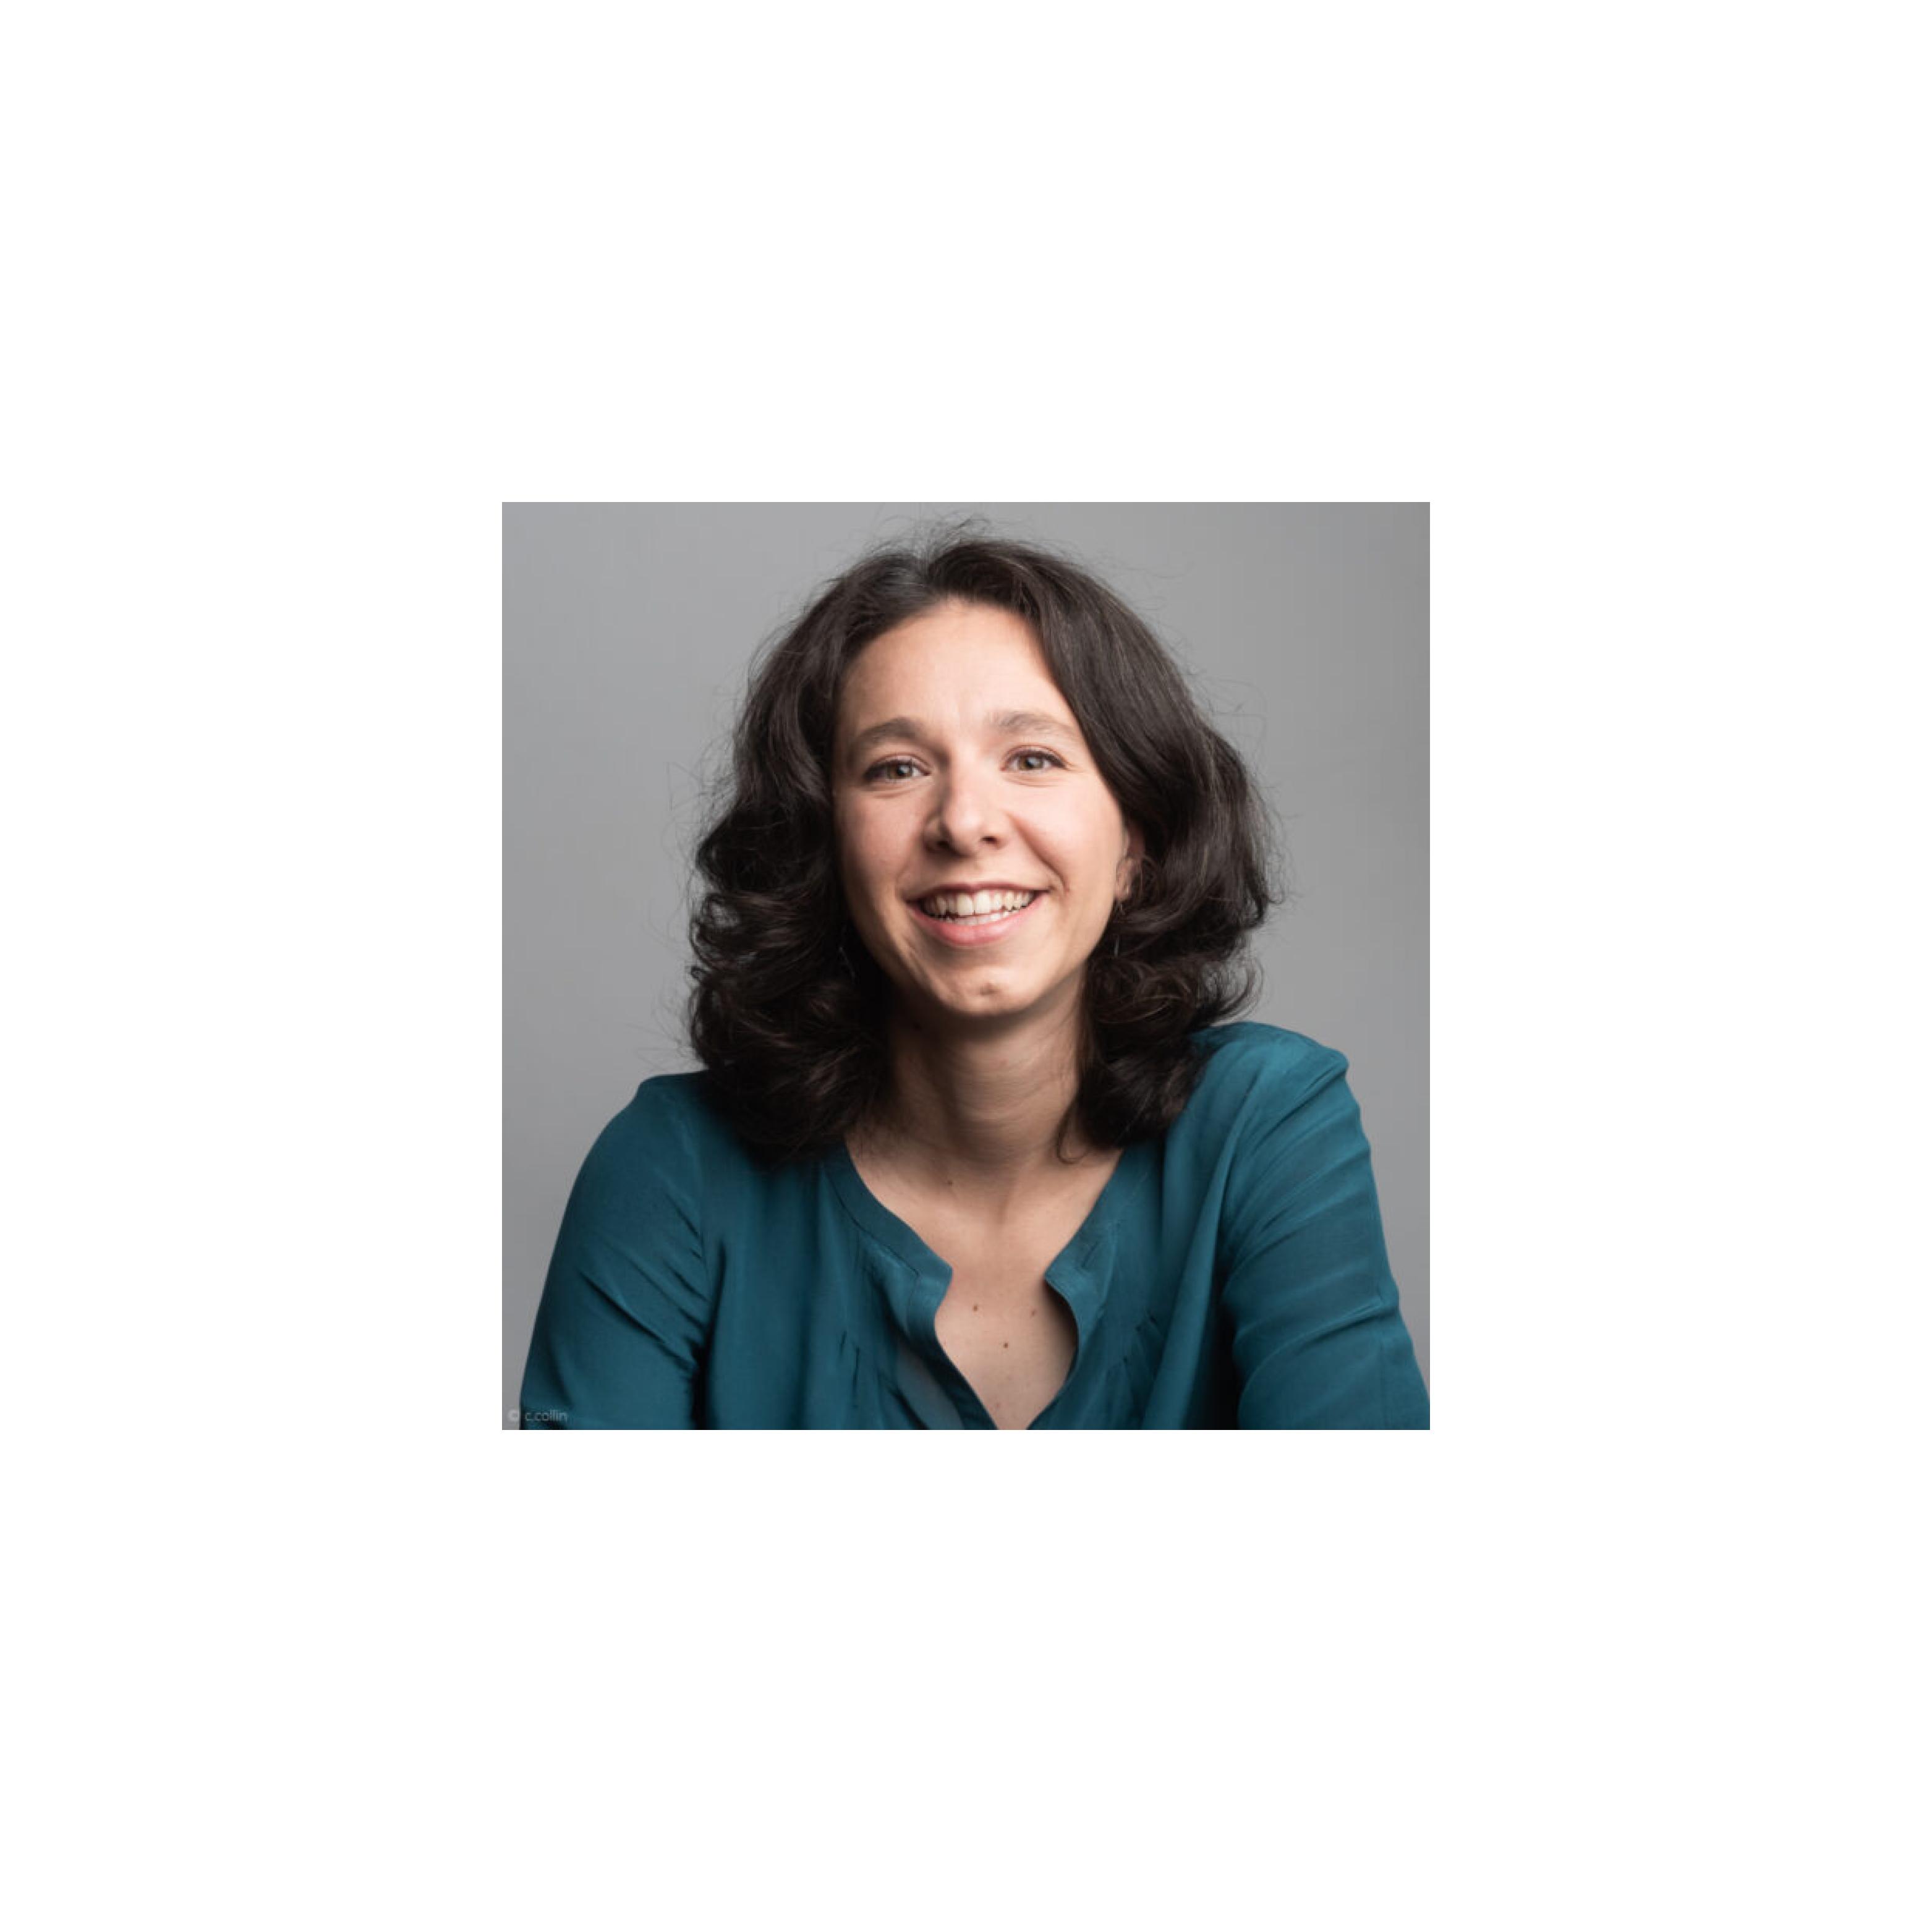 Melanie Belkaiss Objectif Gard